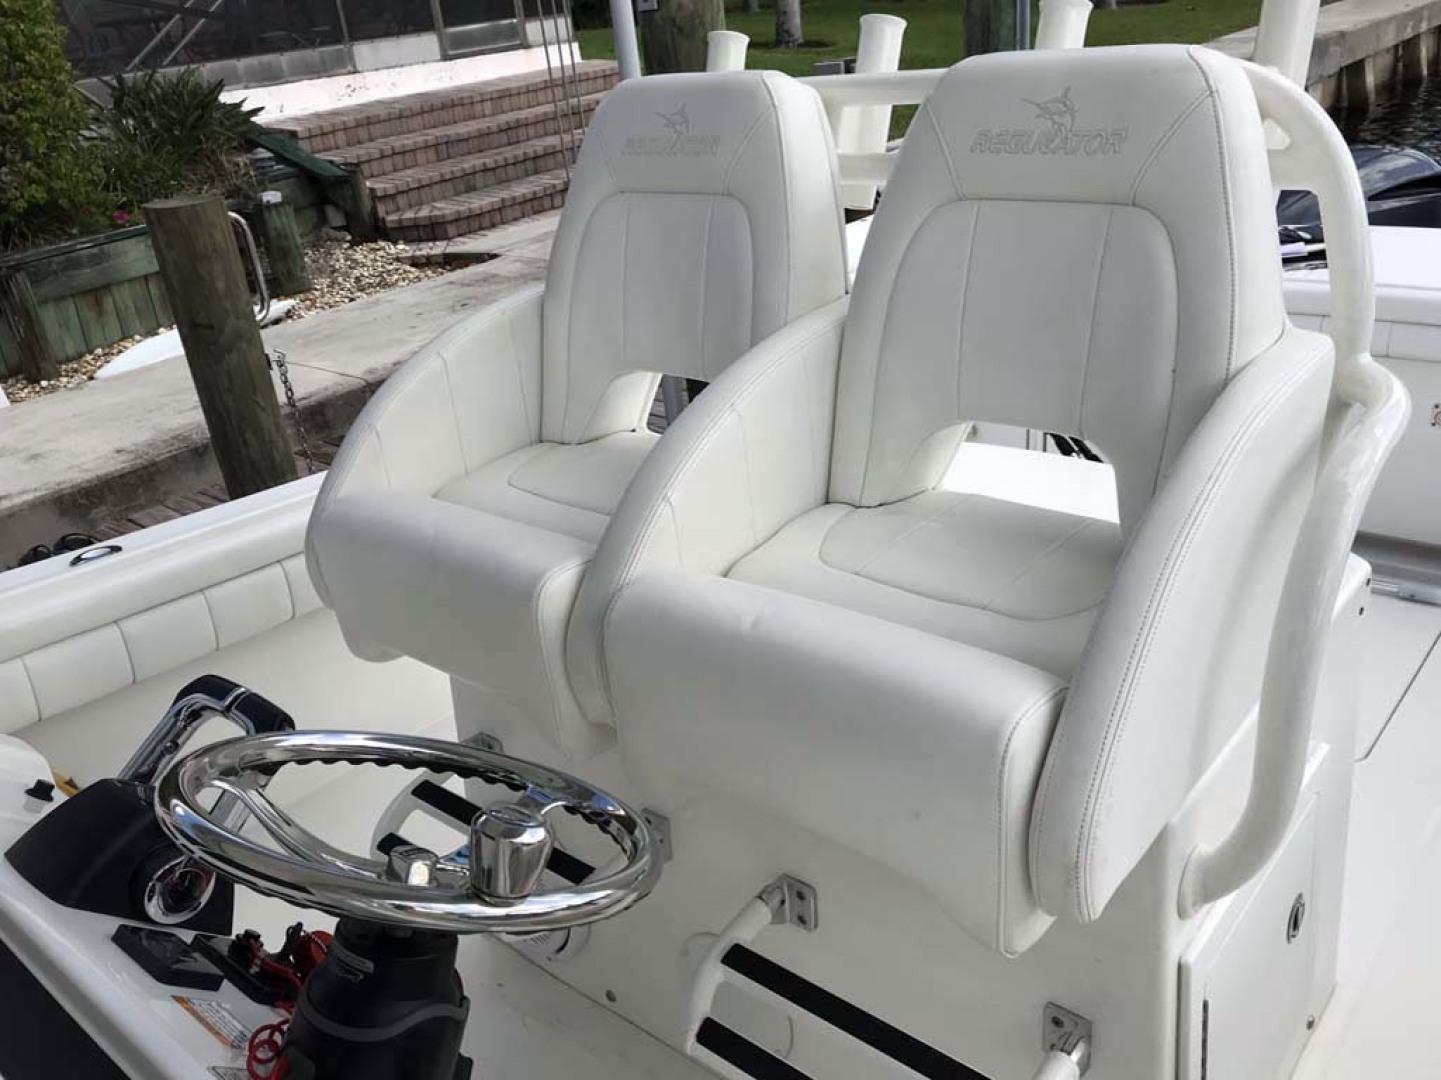 Regulator-31 Center Console 2017 -Stuart-Florida-United States-Helm Seats-1253425   Thumbnail